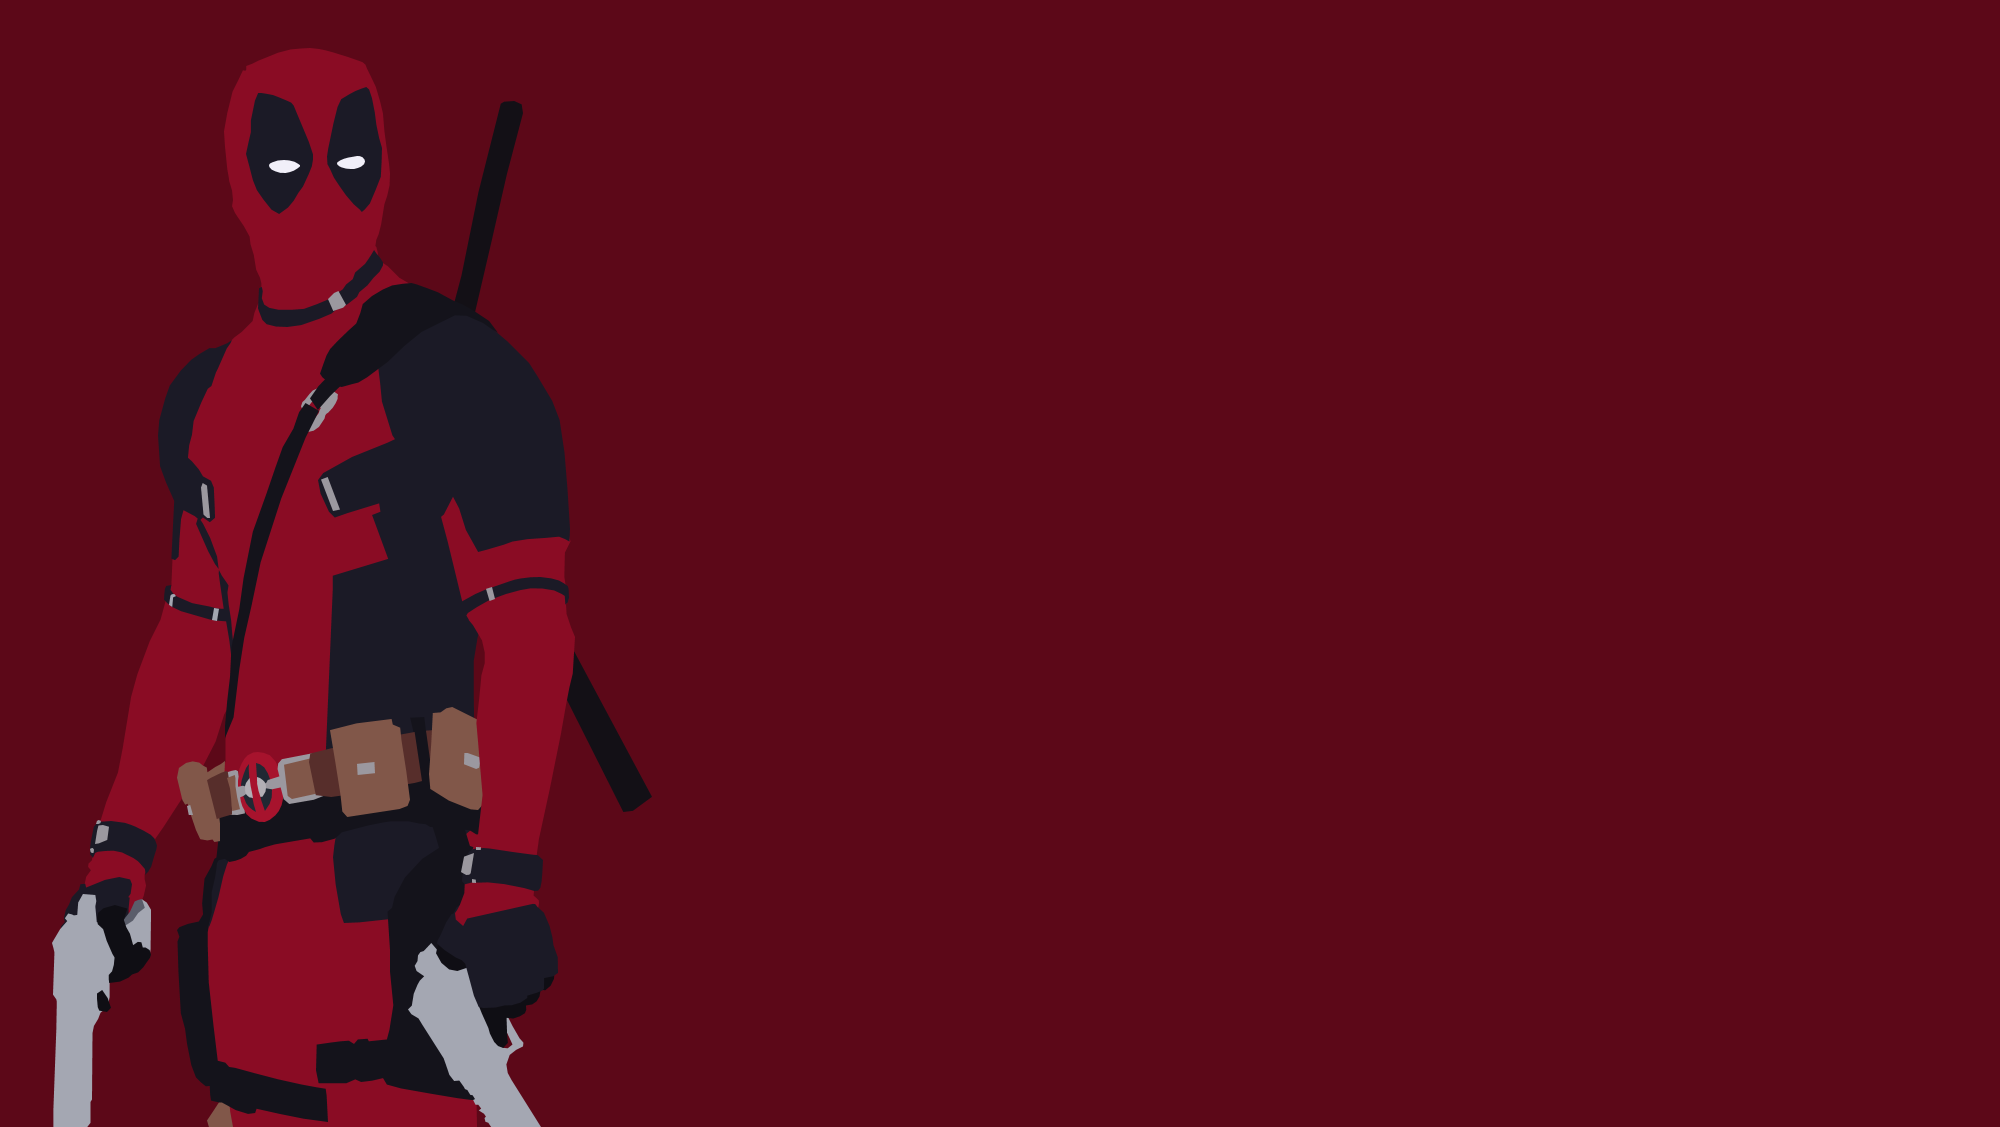 Daftar Deadpool Wallpaper Minimalist Wallpaper Kapal